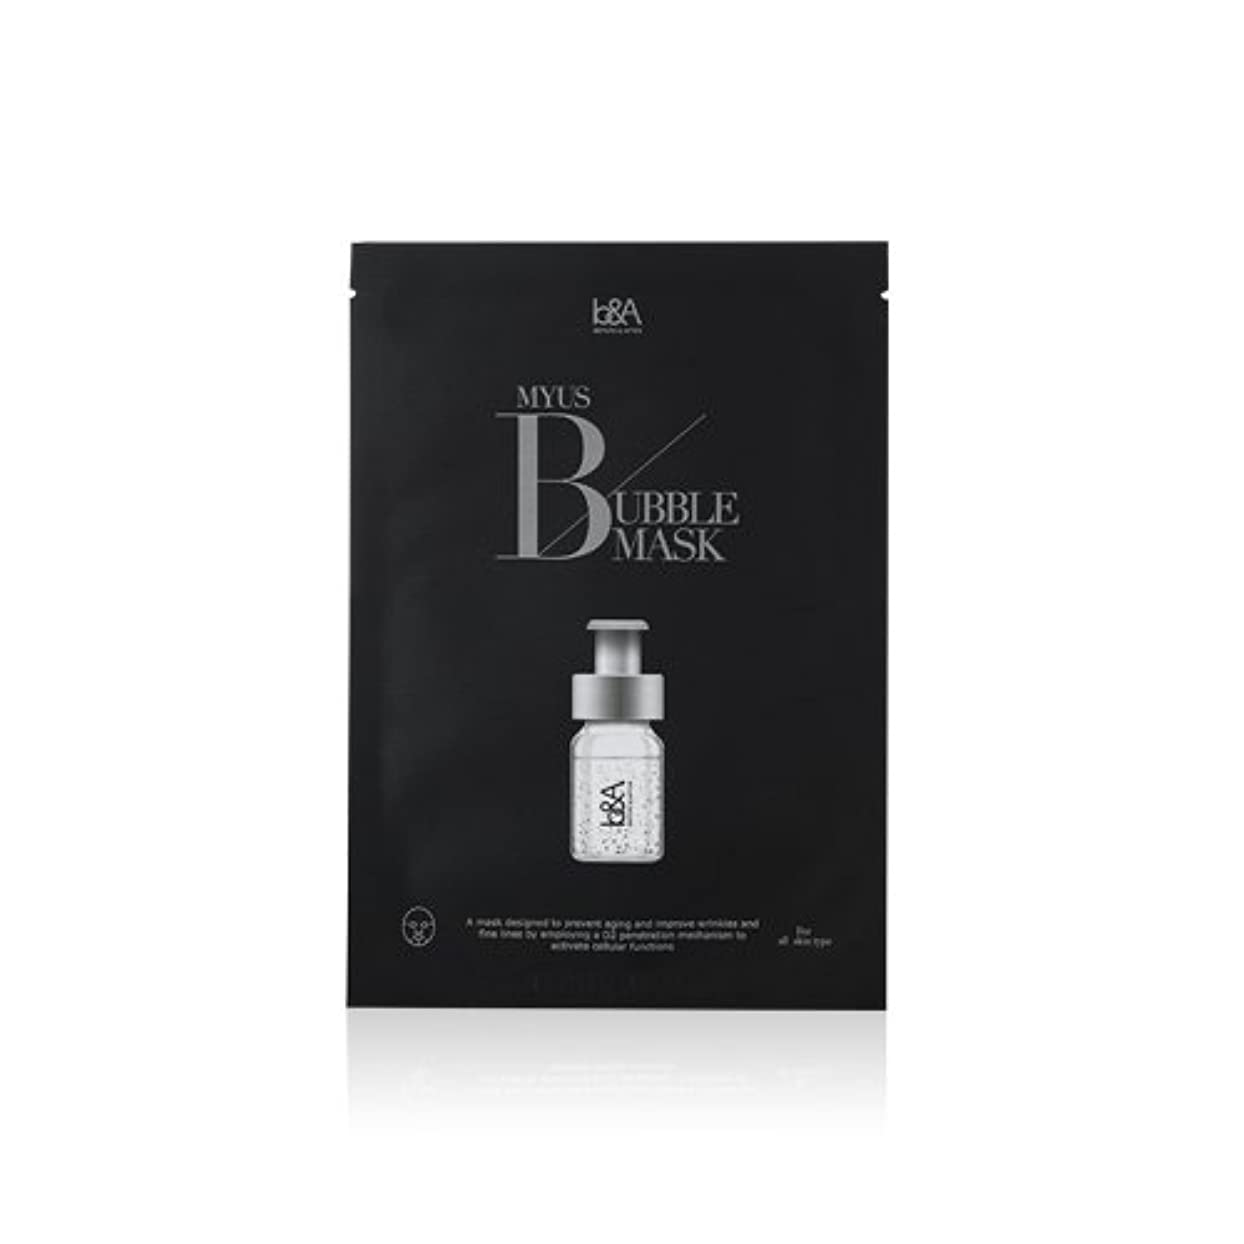 モック磁気磁気BigBang Top [K cosmetic][K beauty] Celeb's-Secret MYUS BUBBLE MASK 5pcs [海外直送品][並行輸入品]